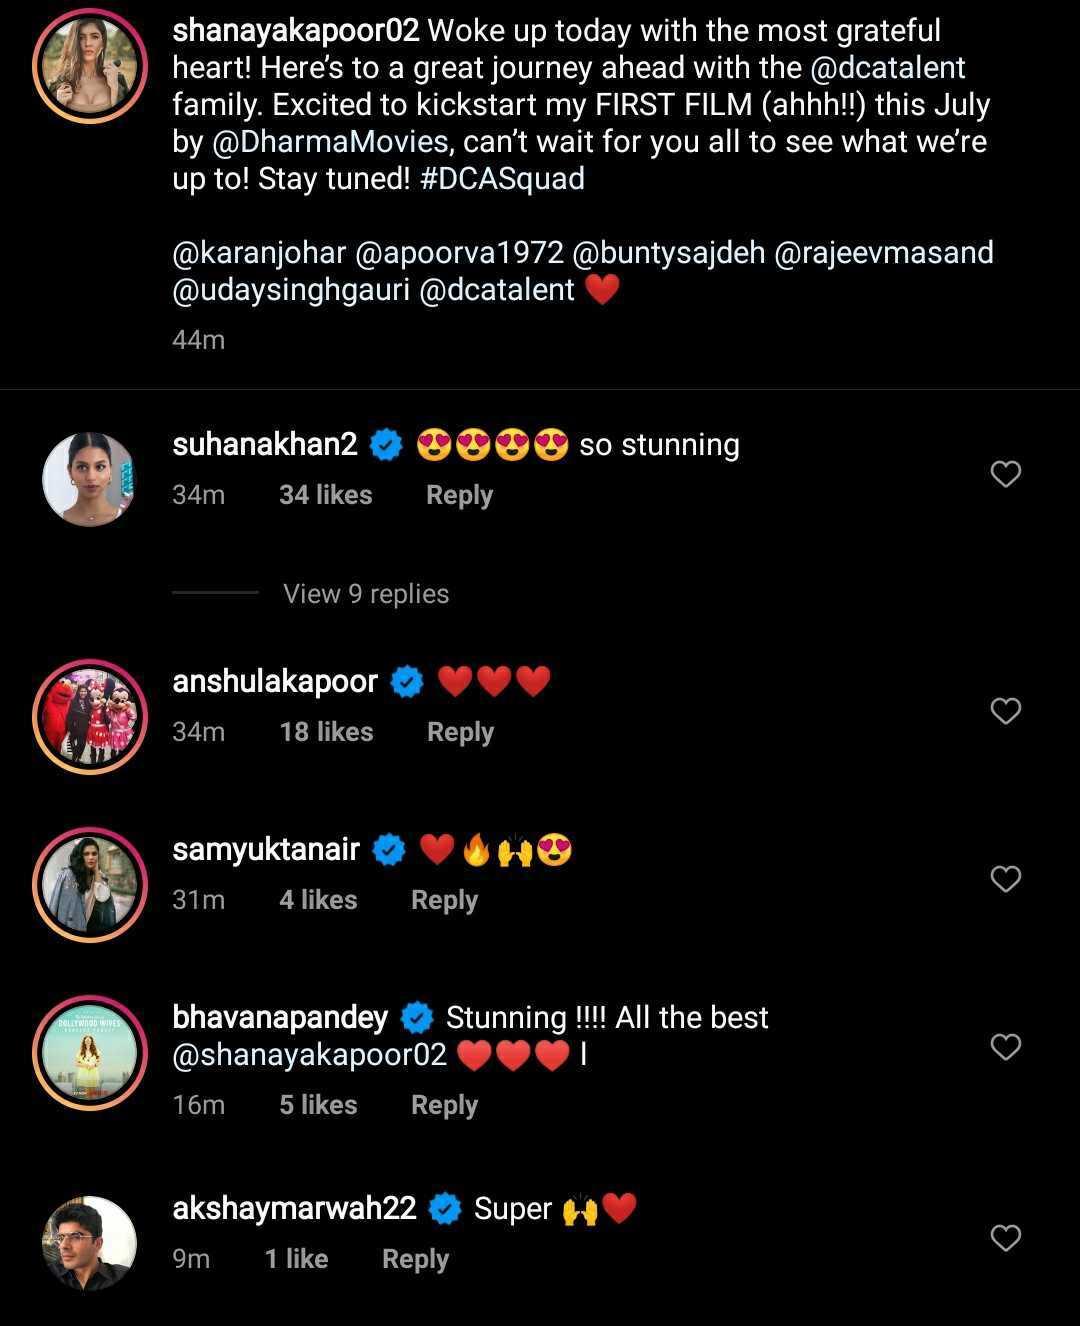 Suhana Khan congratulating Shanaya Kapoor